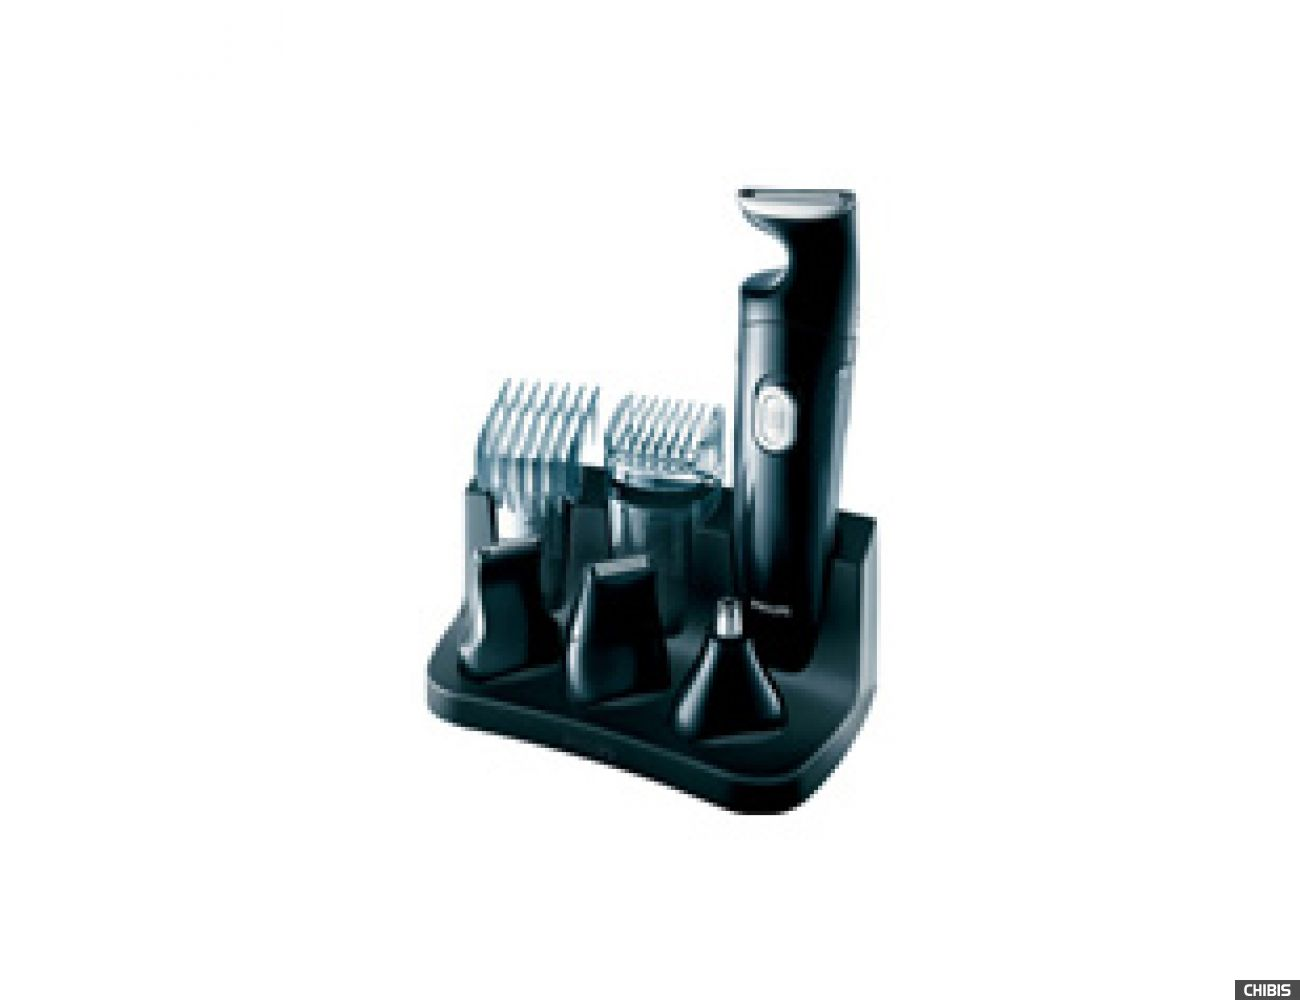 Комплект по уходу за волосами Philips QG 3150/30